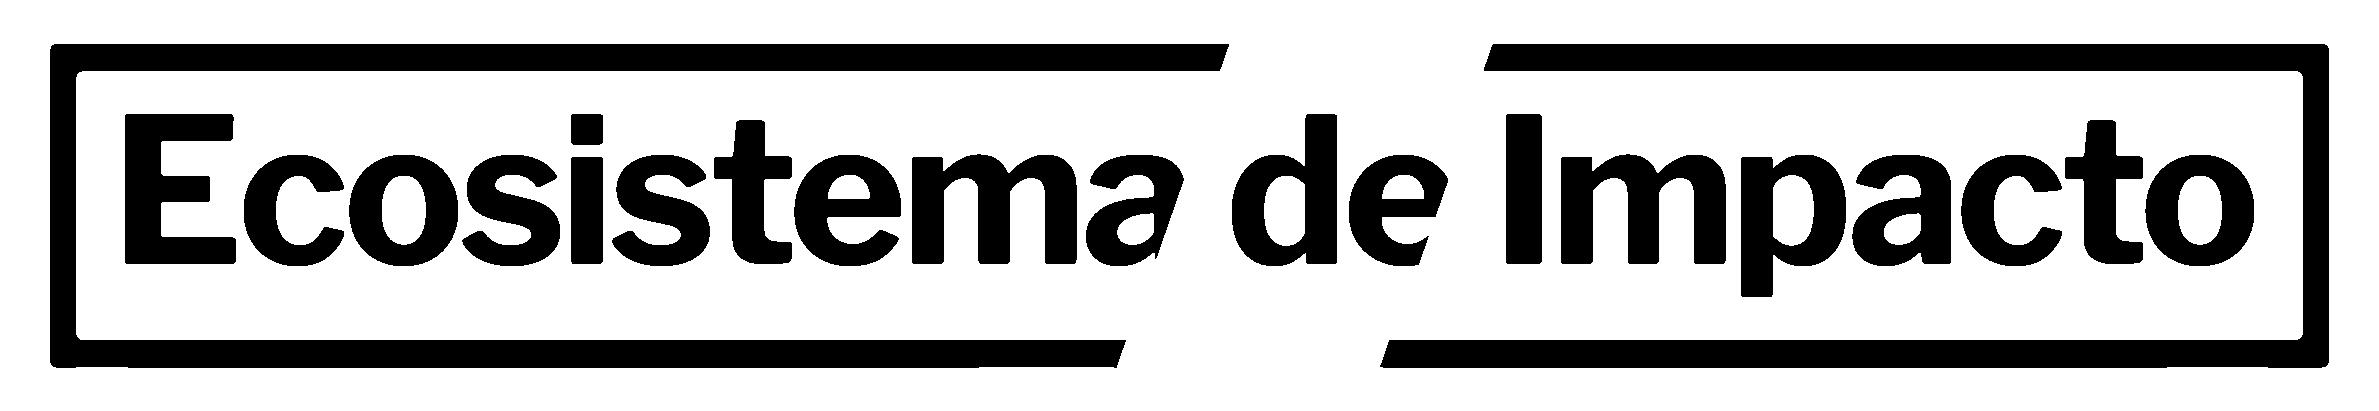 Ecosistema-02